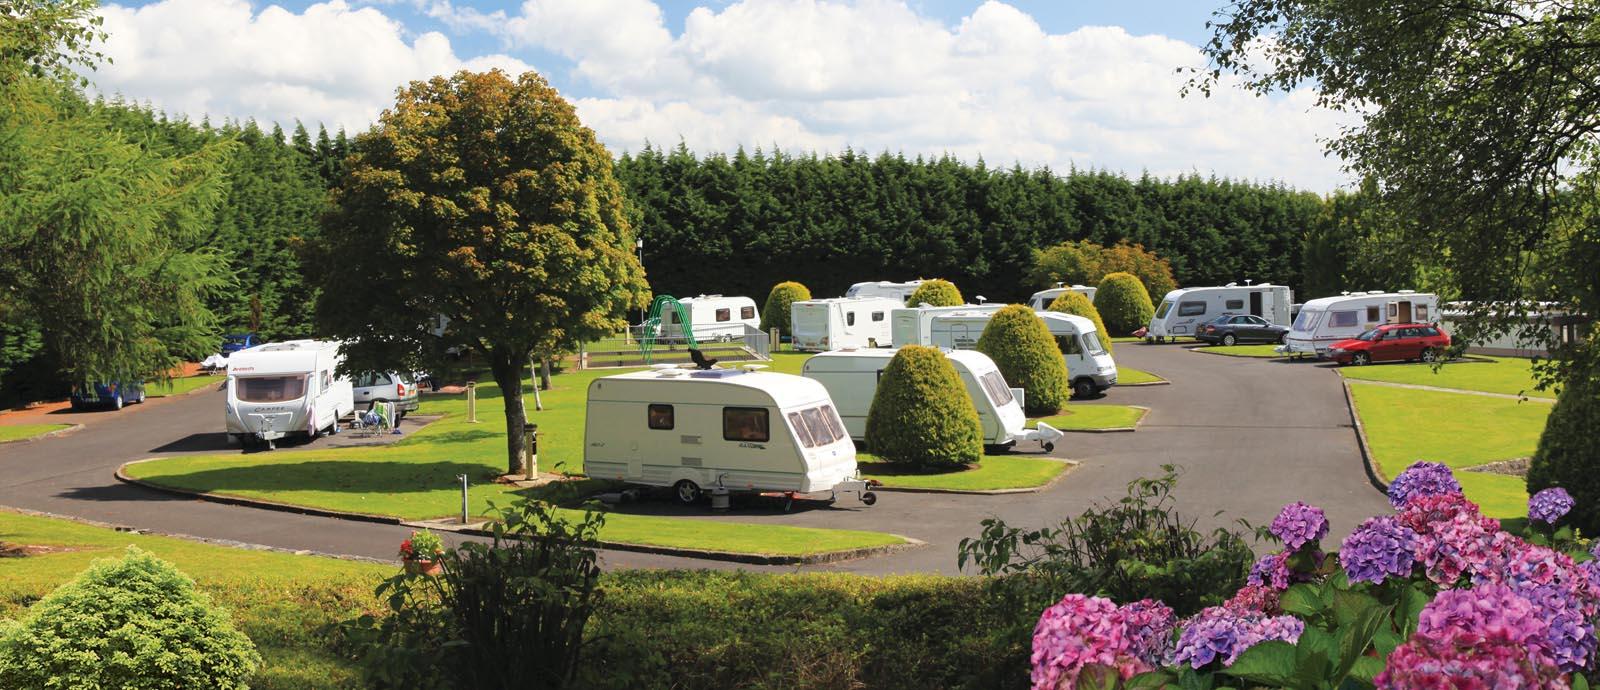 Imagine how cool the caravan park will look like!